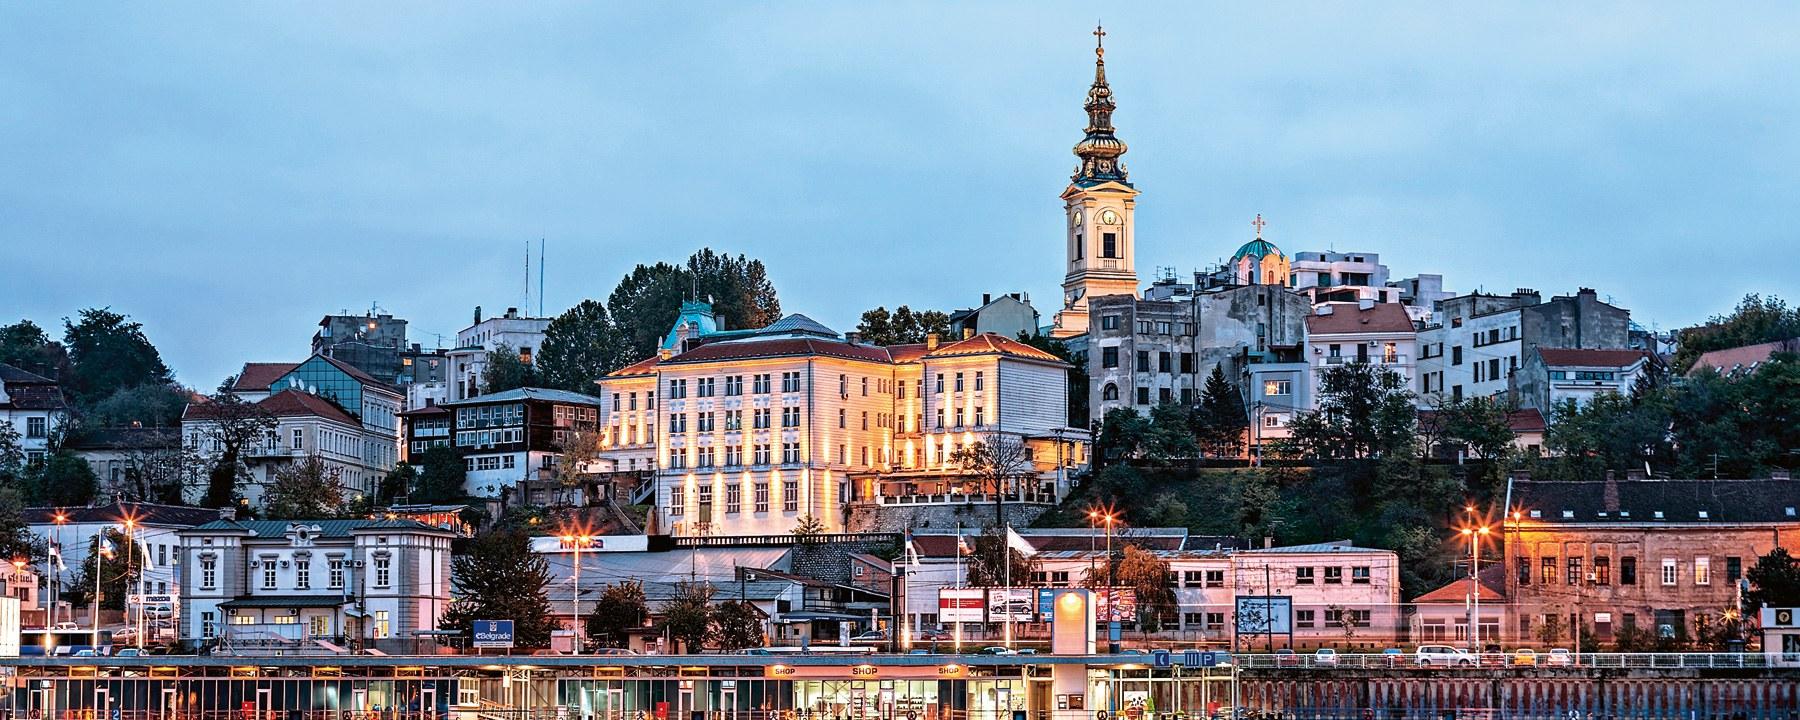 12 Nächte ab Giurgiu (Bukarest), Oltenita (Bukarest), Tulcea, Rousse, Vidin, Donji Milanovac, Belgrad, Mohács, Budapest, Wien und Linz nach Engelhartszell (Passau).